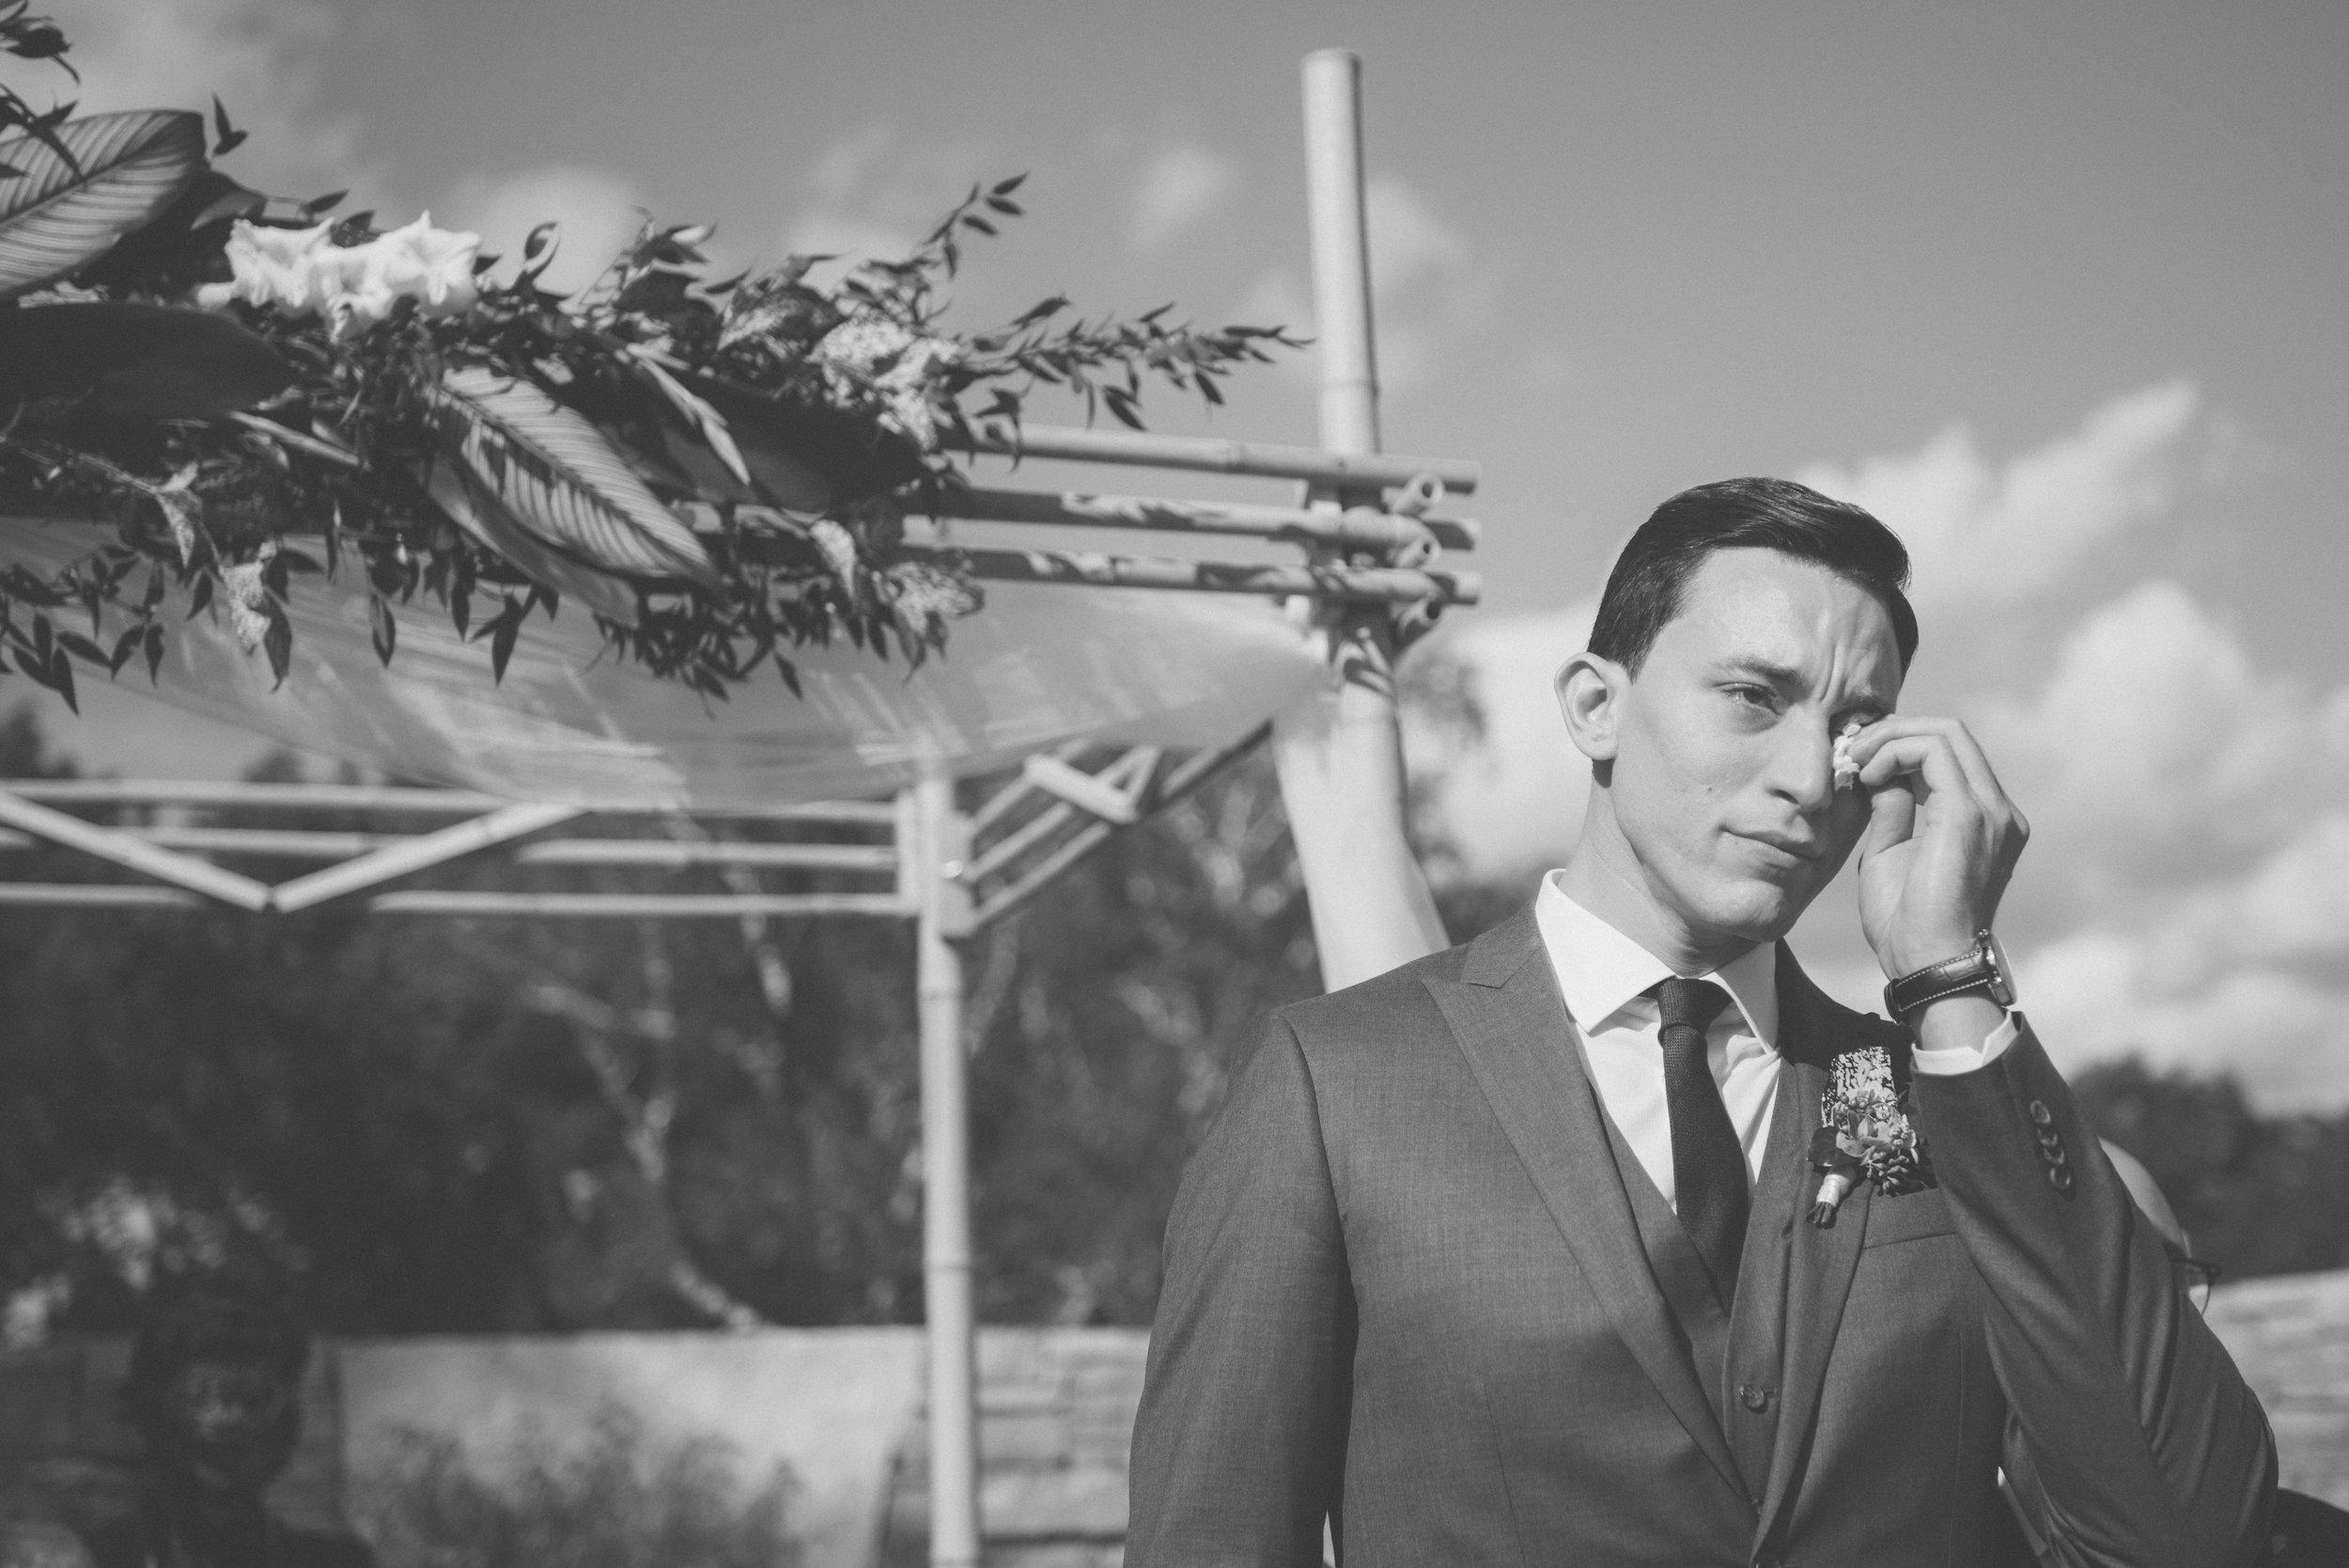 RBG rock garden wedding with soundslikeyellowphotography